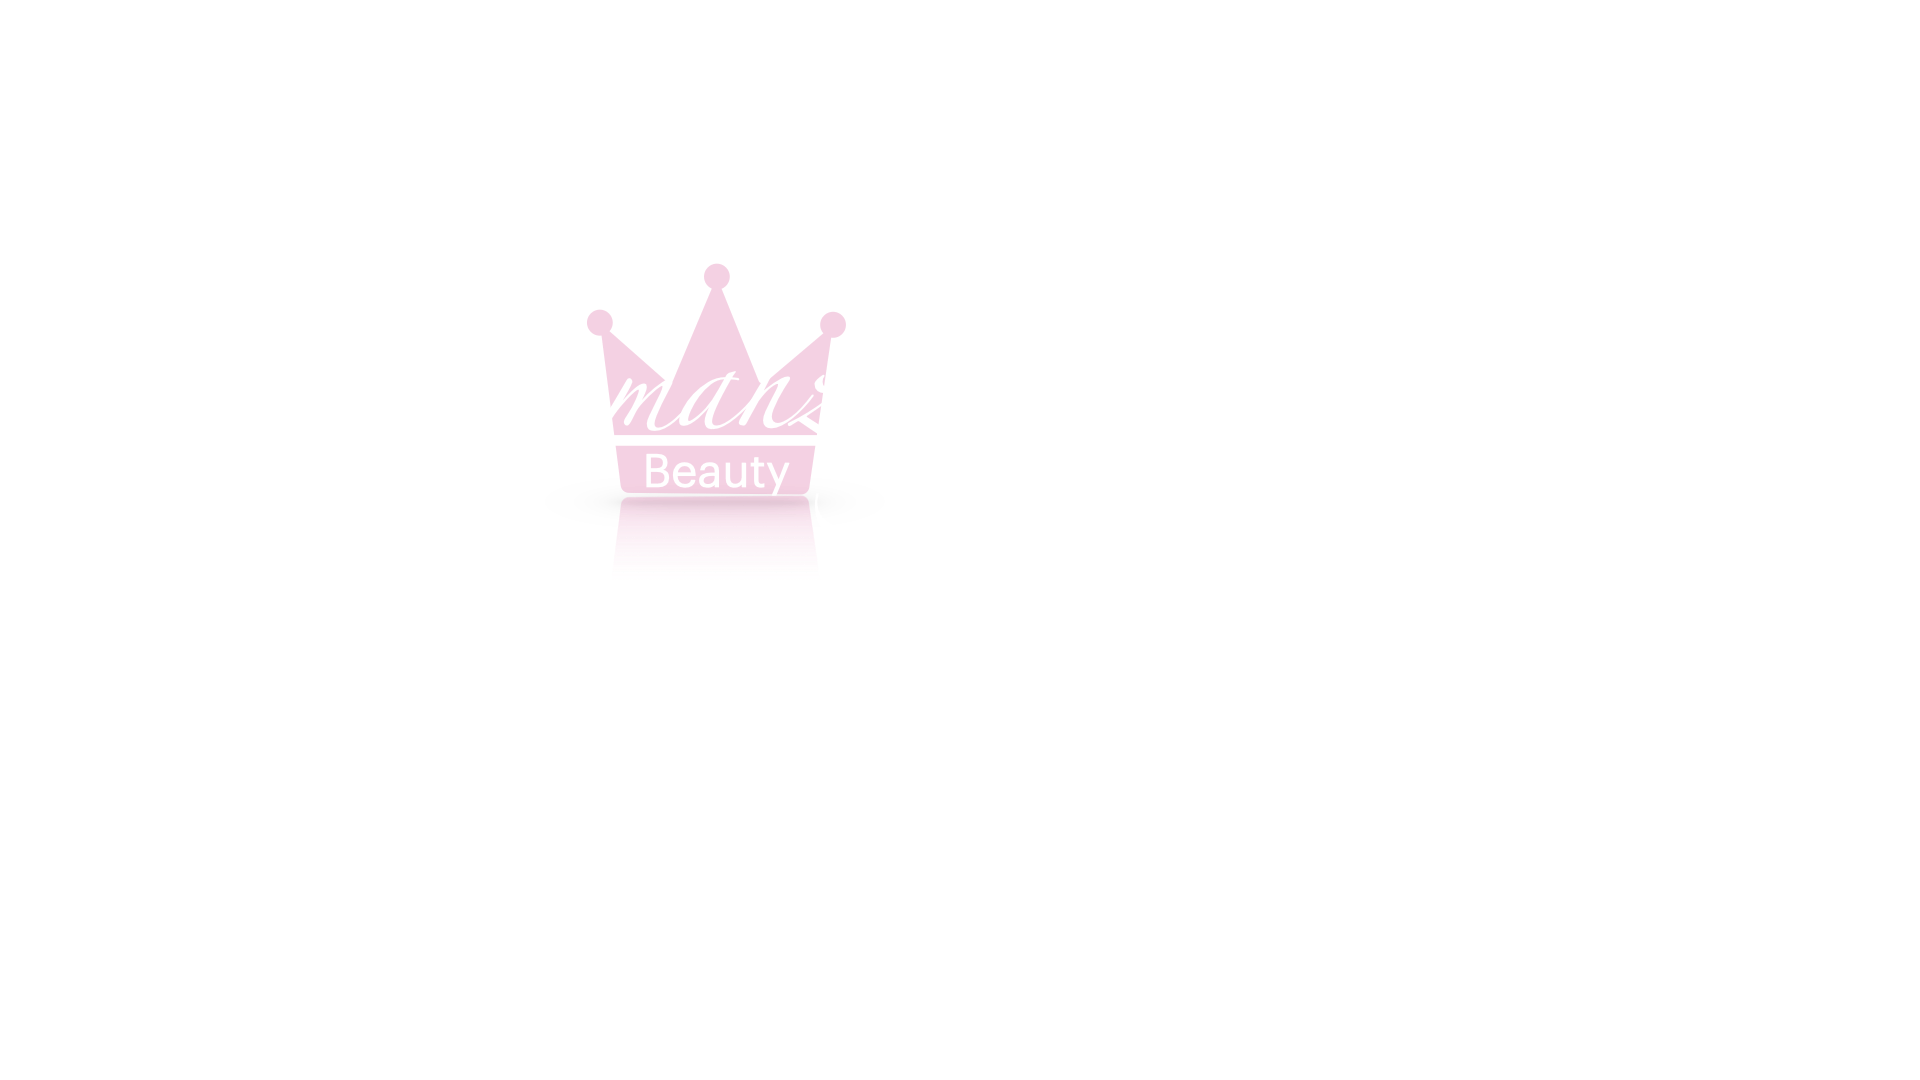 Emmahzing Beauty